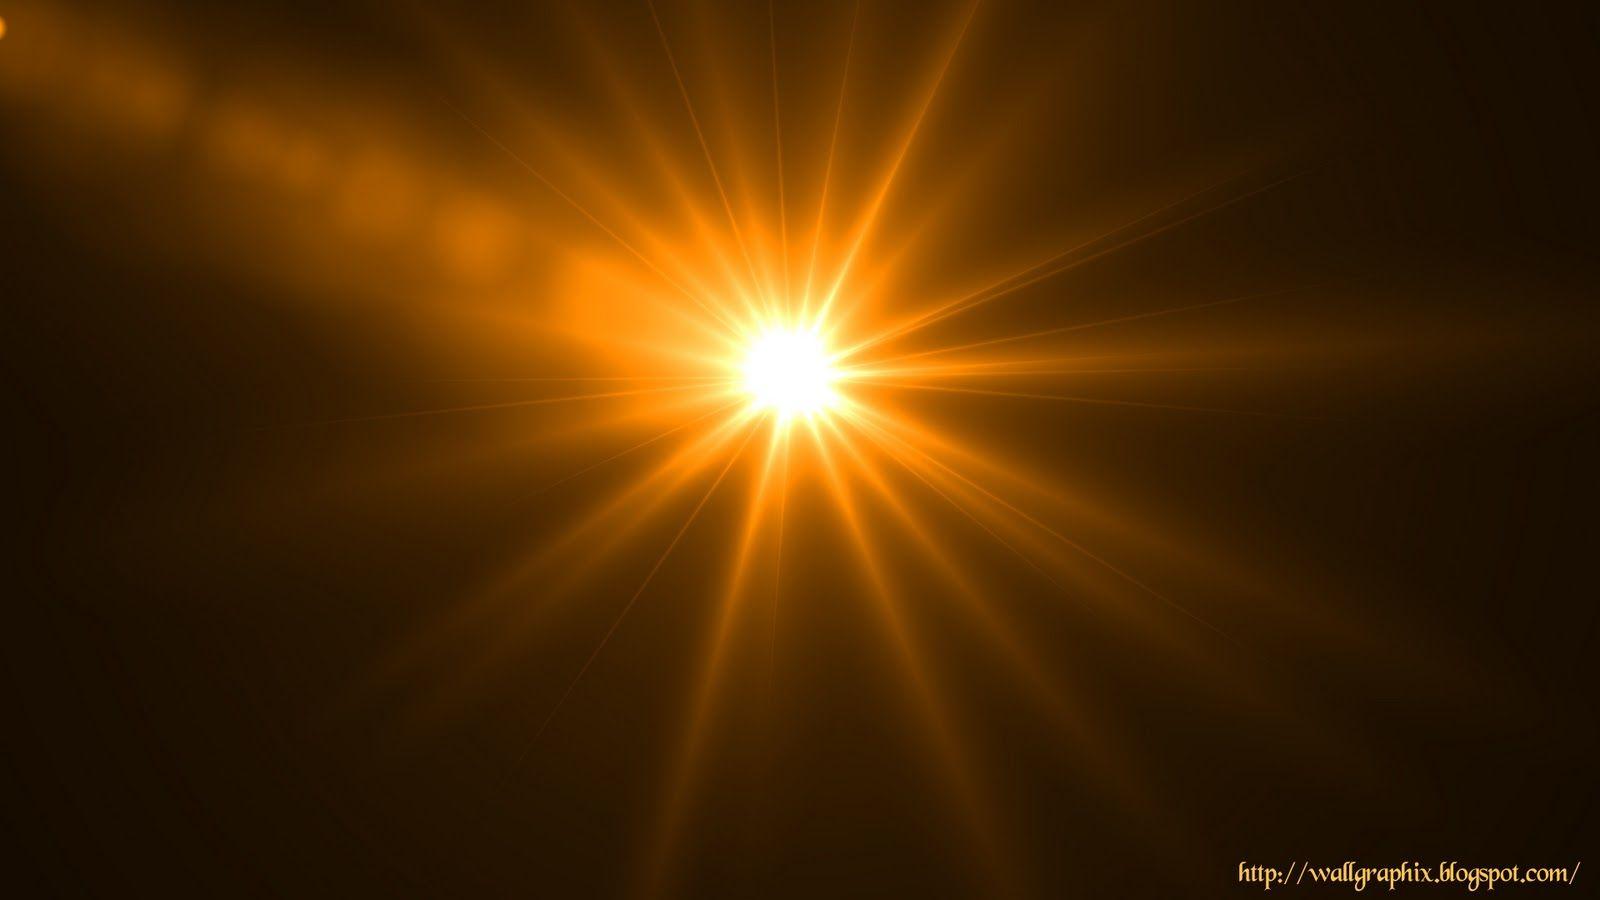 lense flare - Google 검색 | 이펙트 | Optical flares, Hd ...